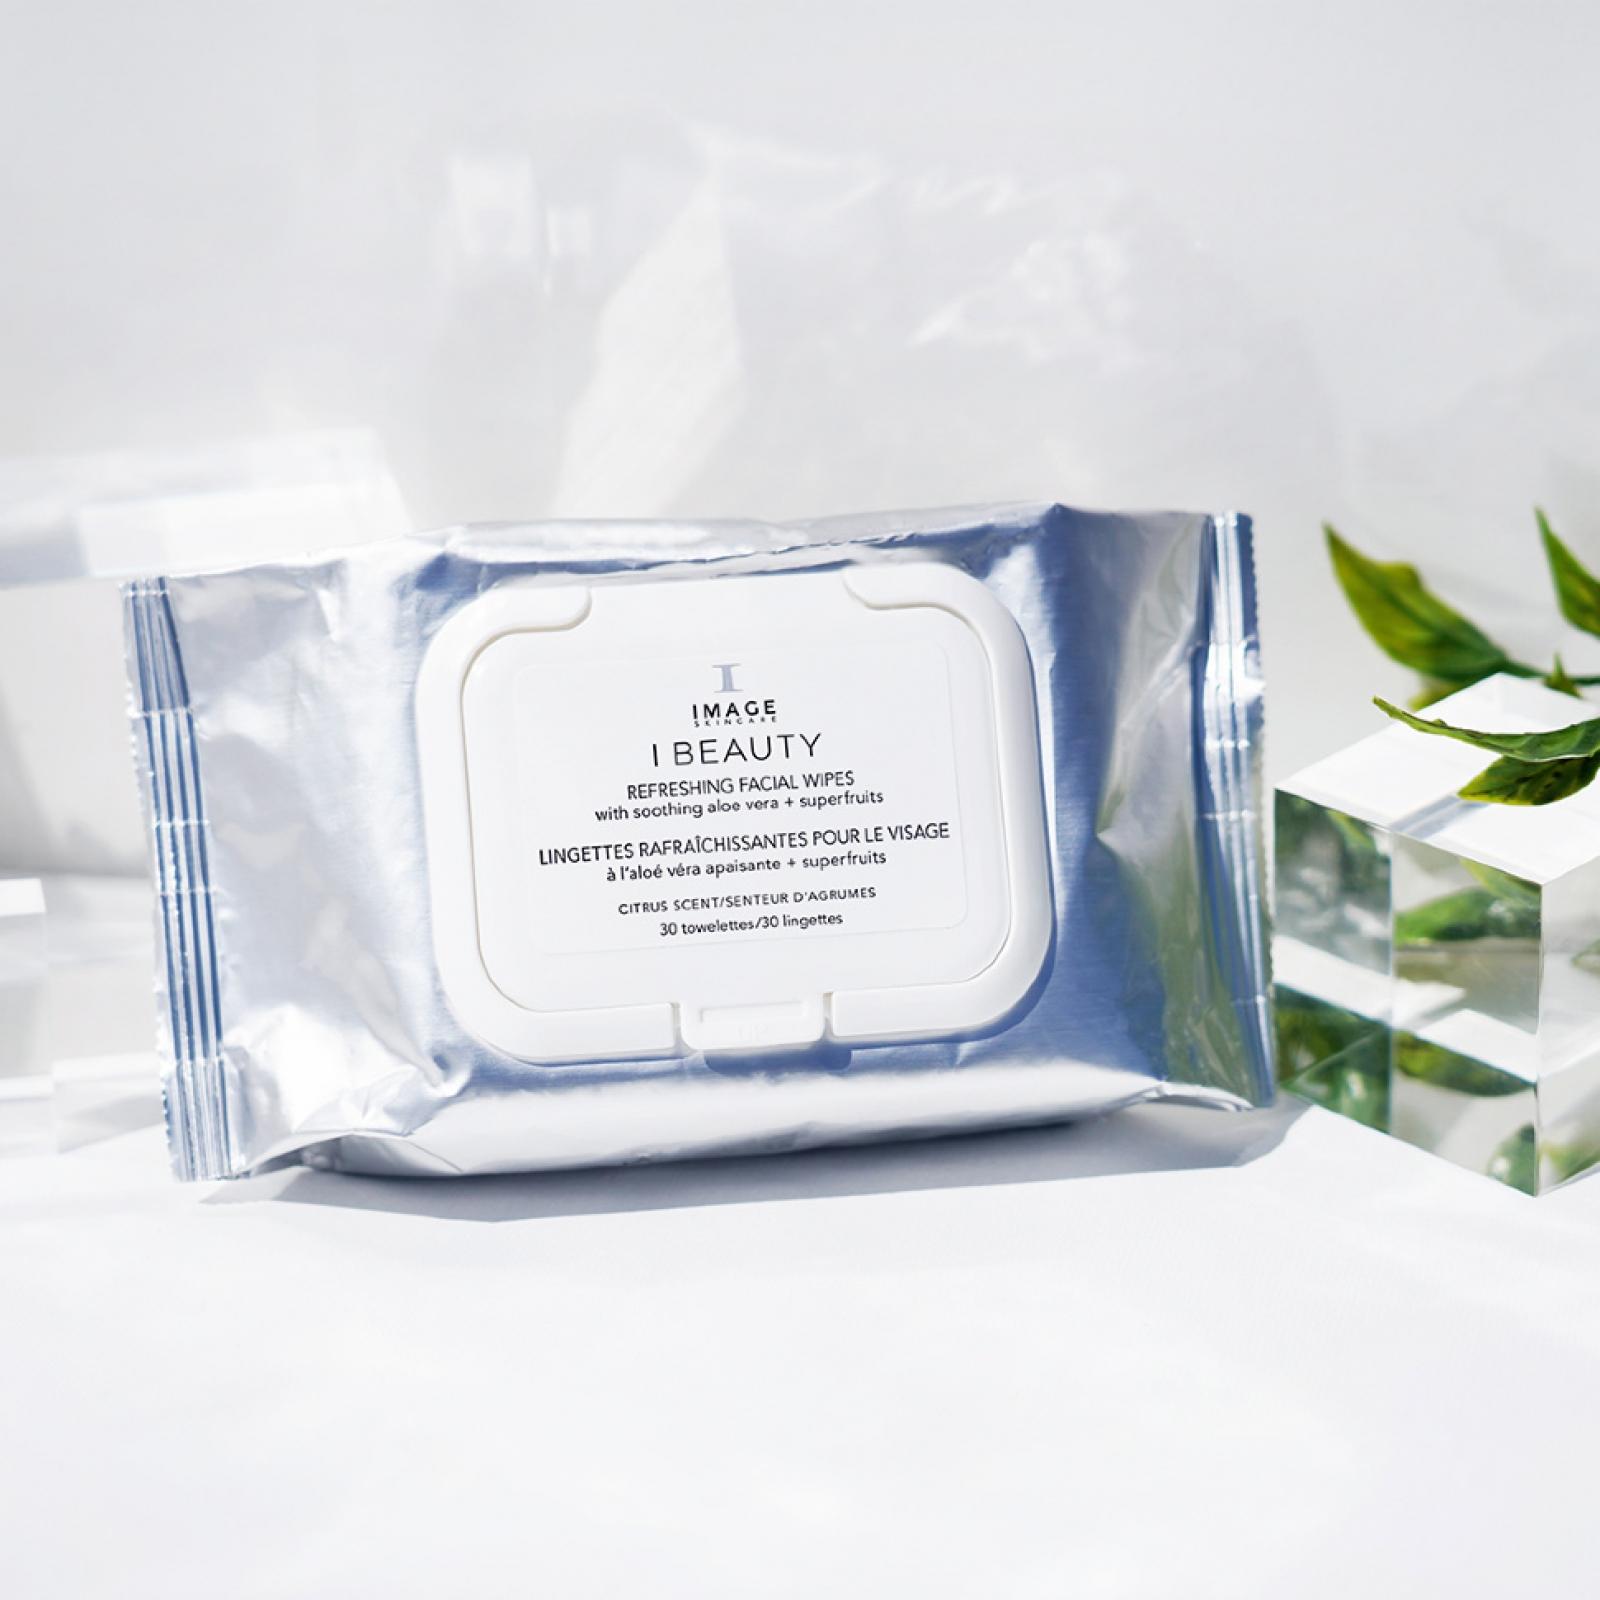 I BEAUTY Refreshing Facial Wipes - Очищающие салфетки для лица